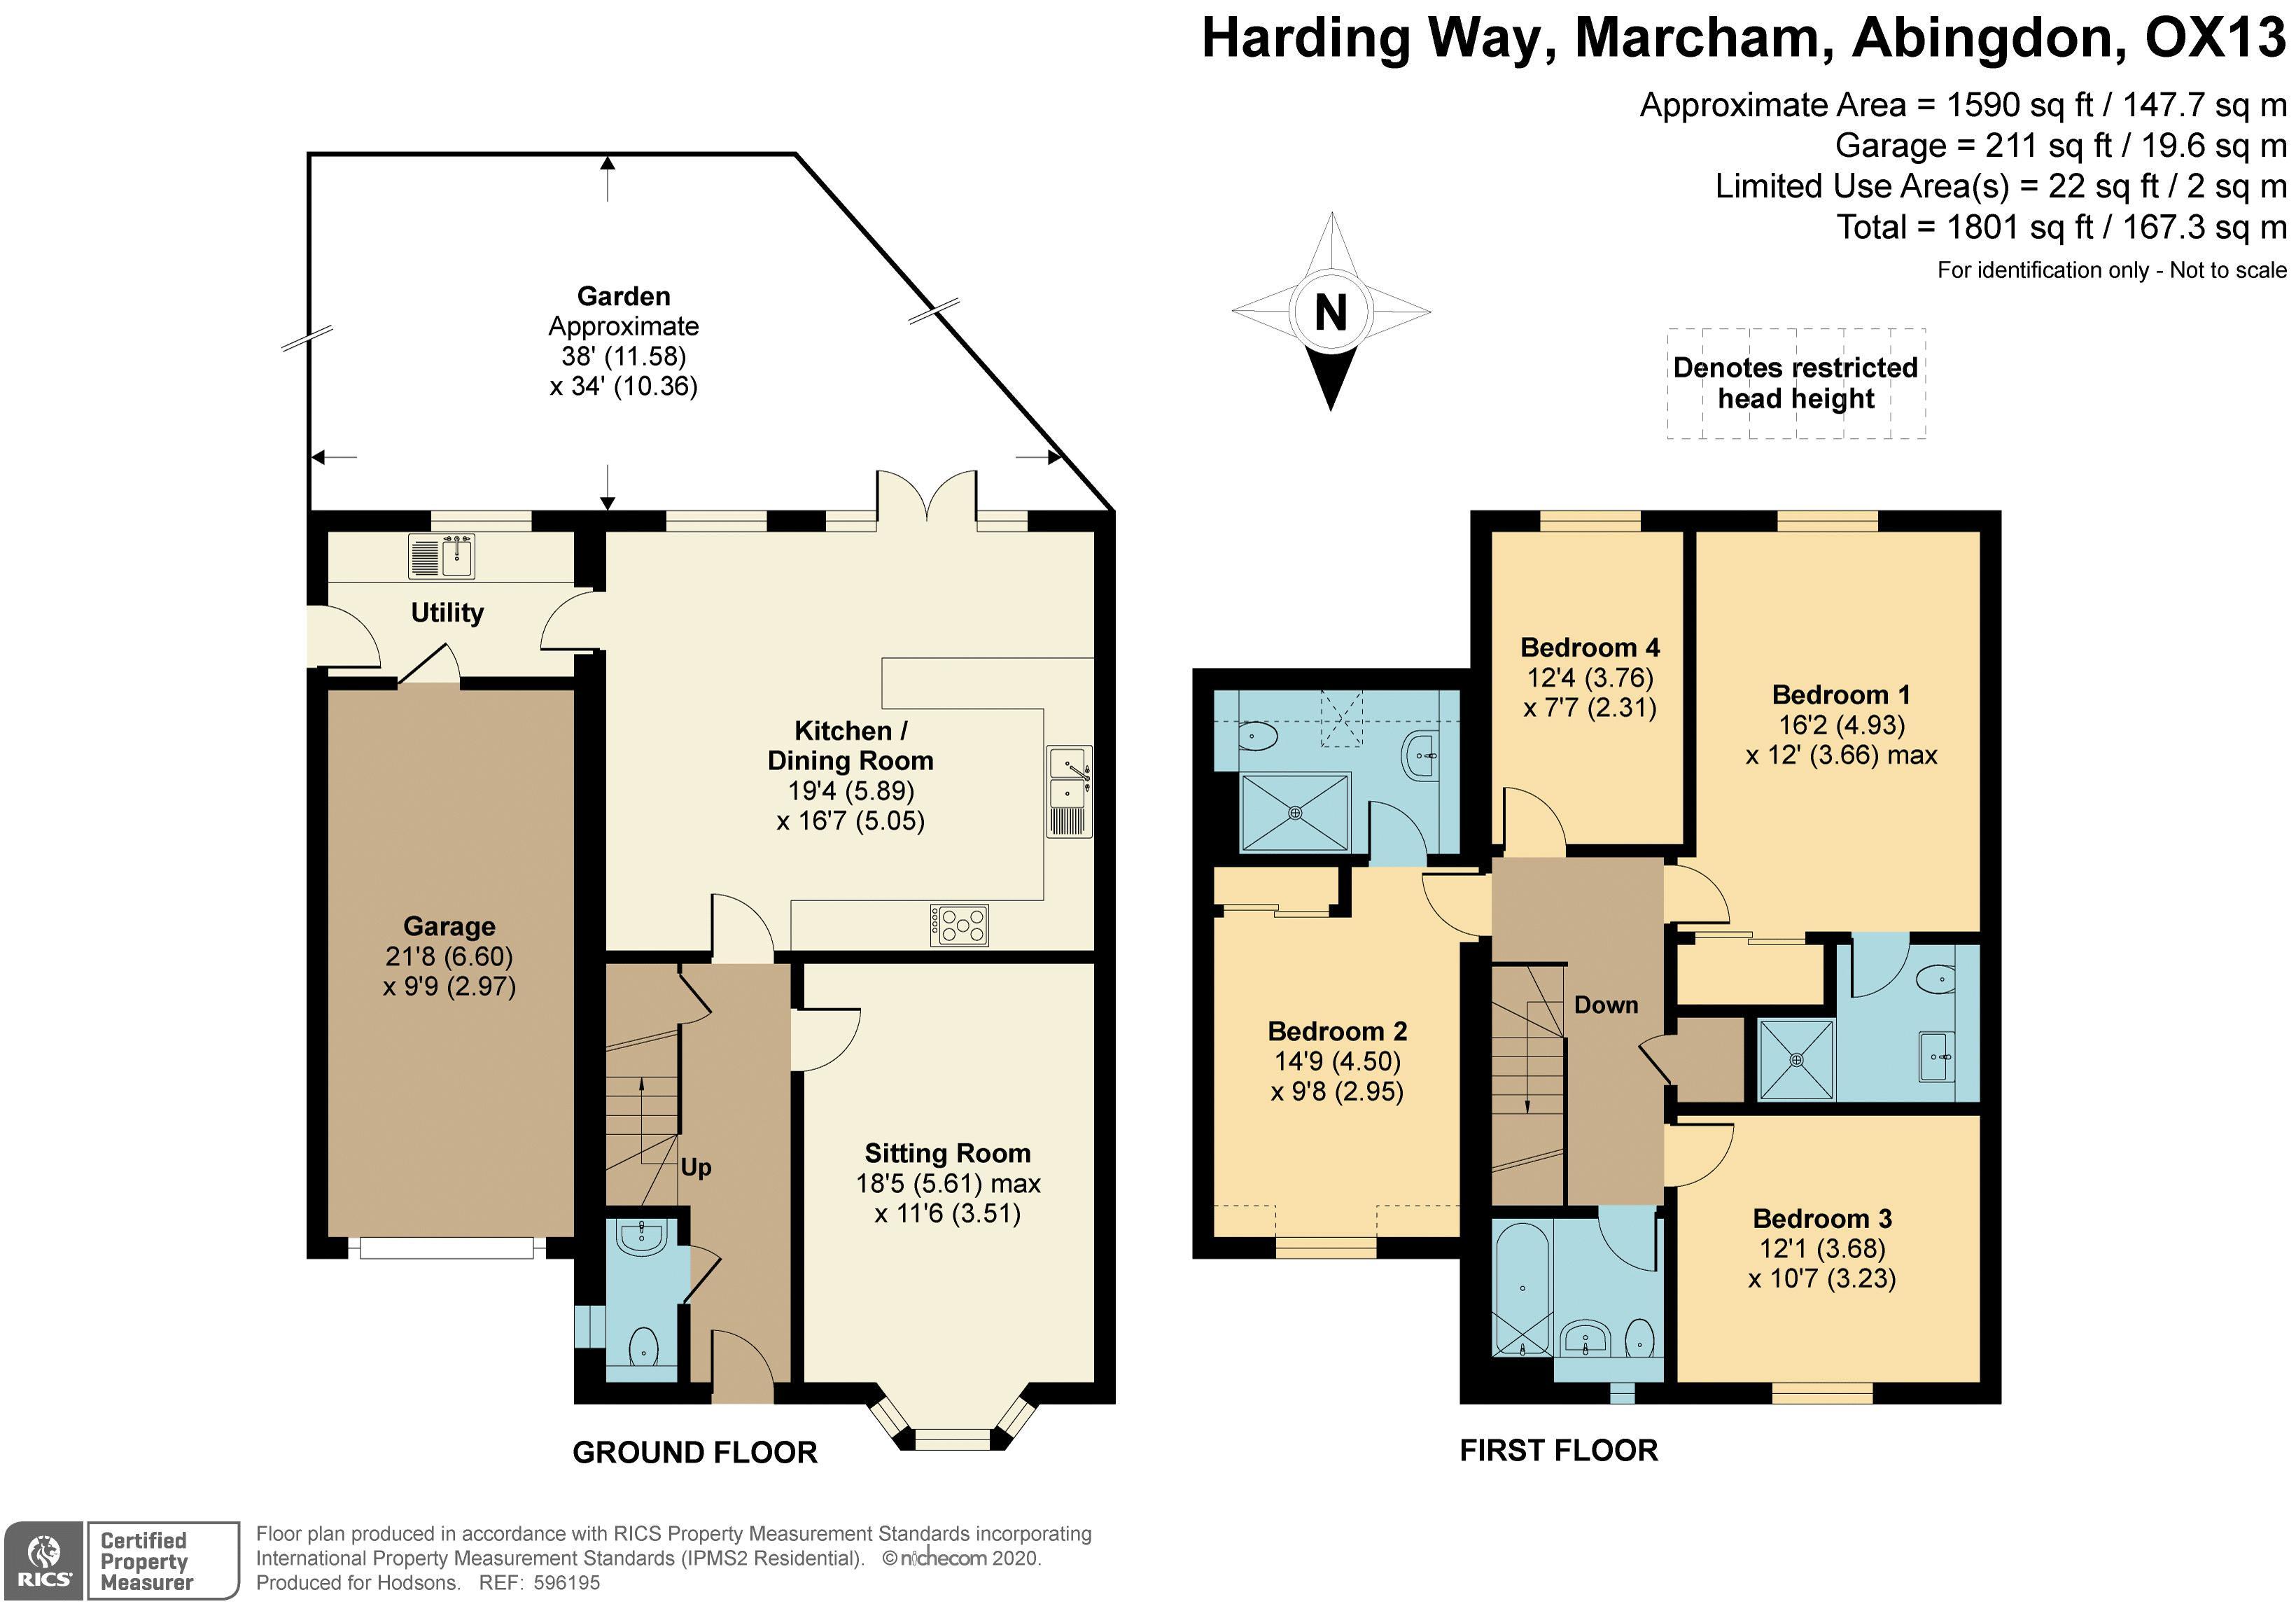 Harding Way Marcham